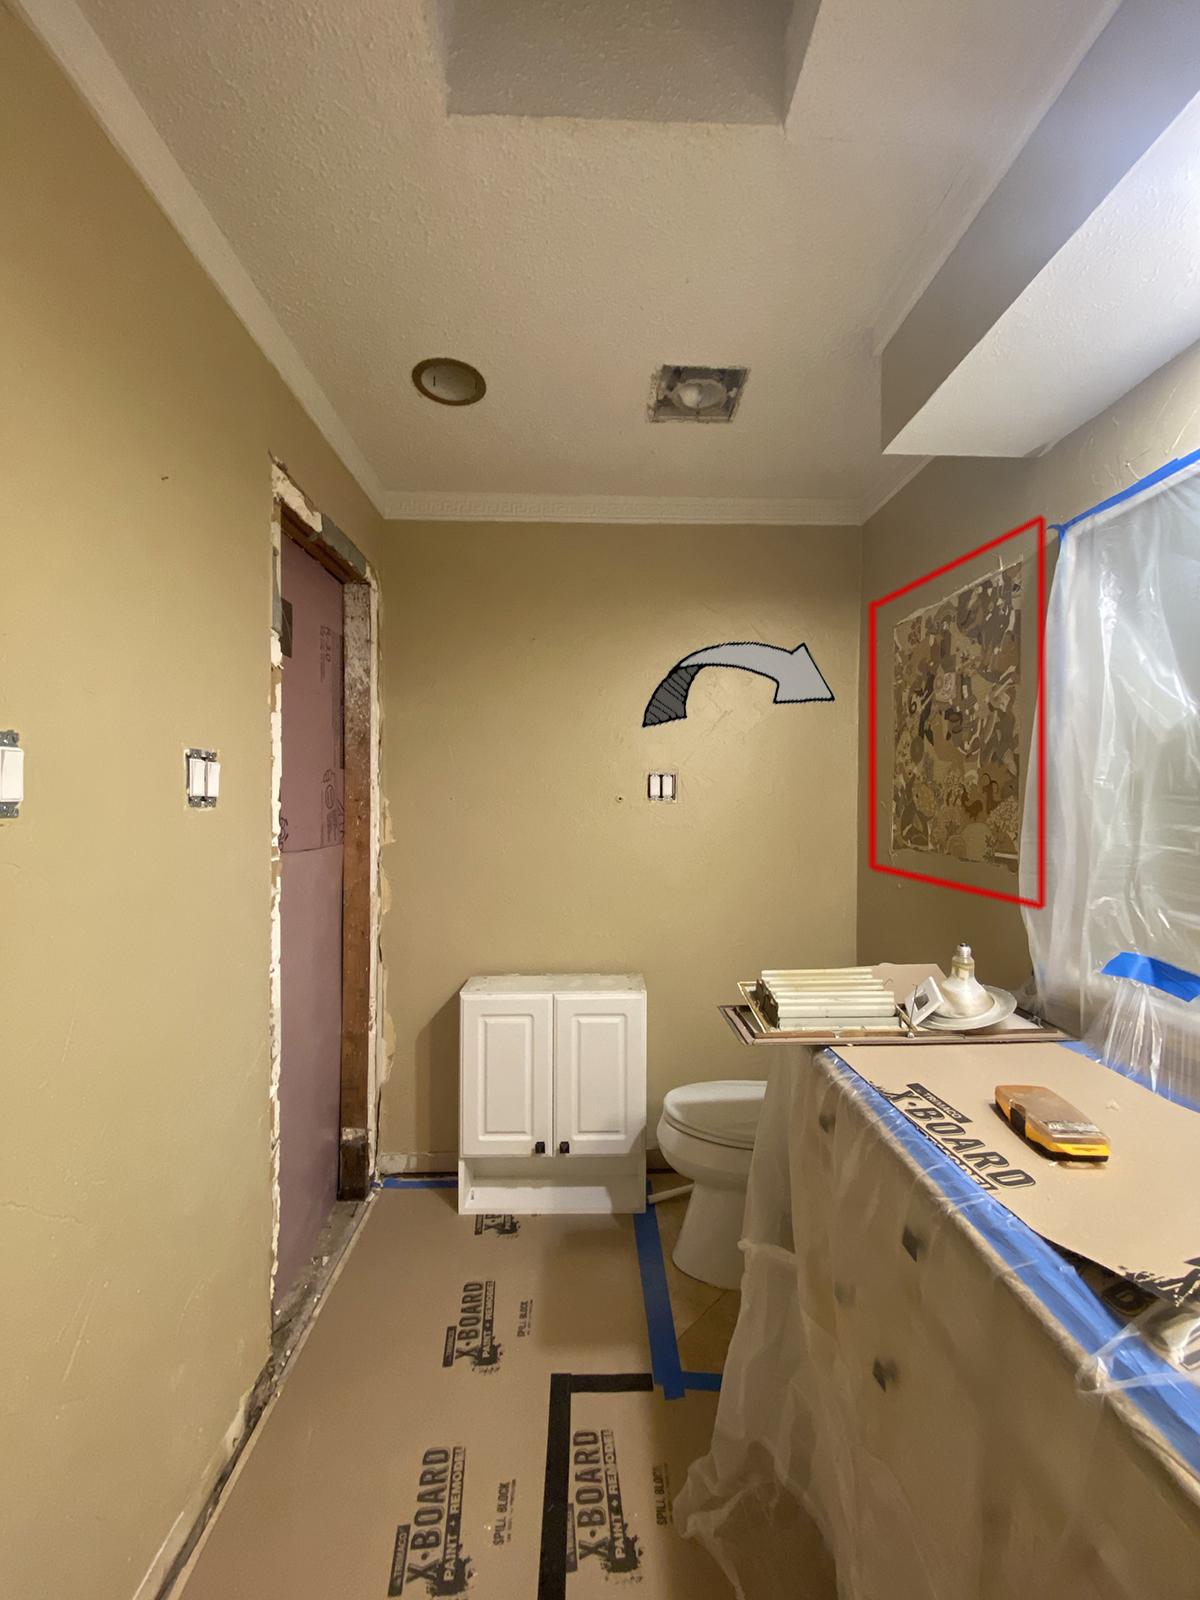 Wallpaper above toilet - sneak peak